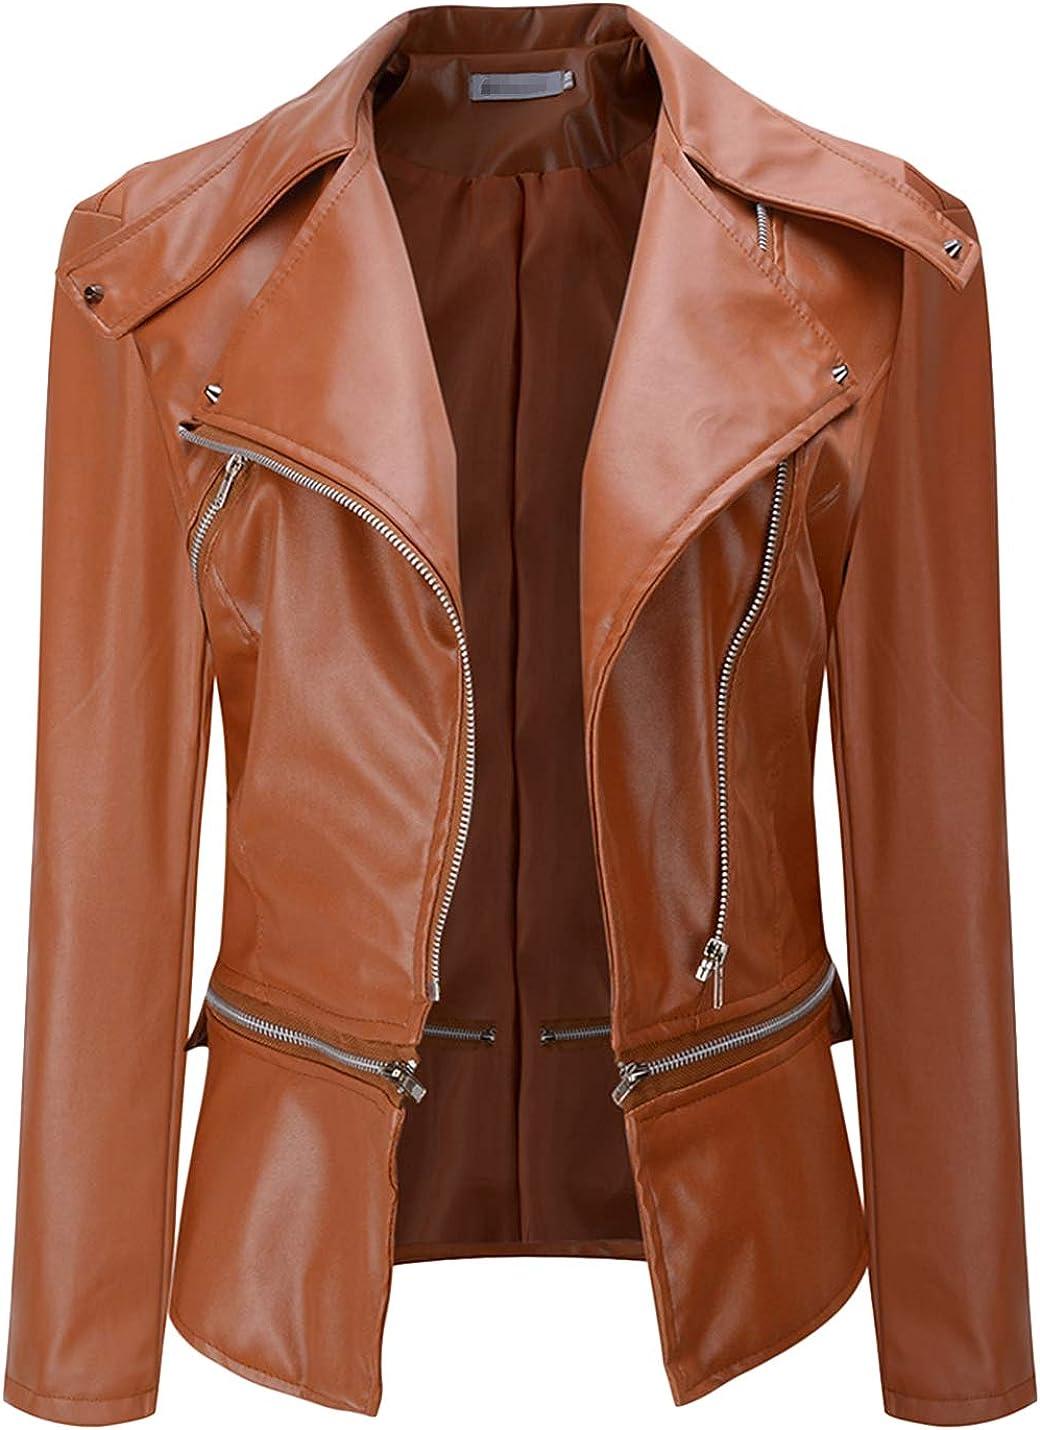 Uaneo Women's Notch Lapel Zip Up PU Leather Short Slim Moto Biker Jacket Coats (Orange, Small)